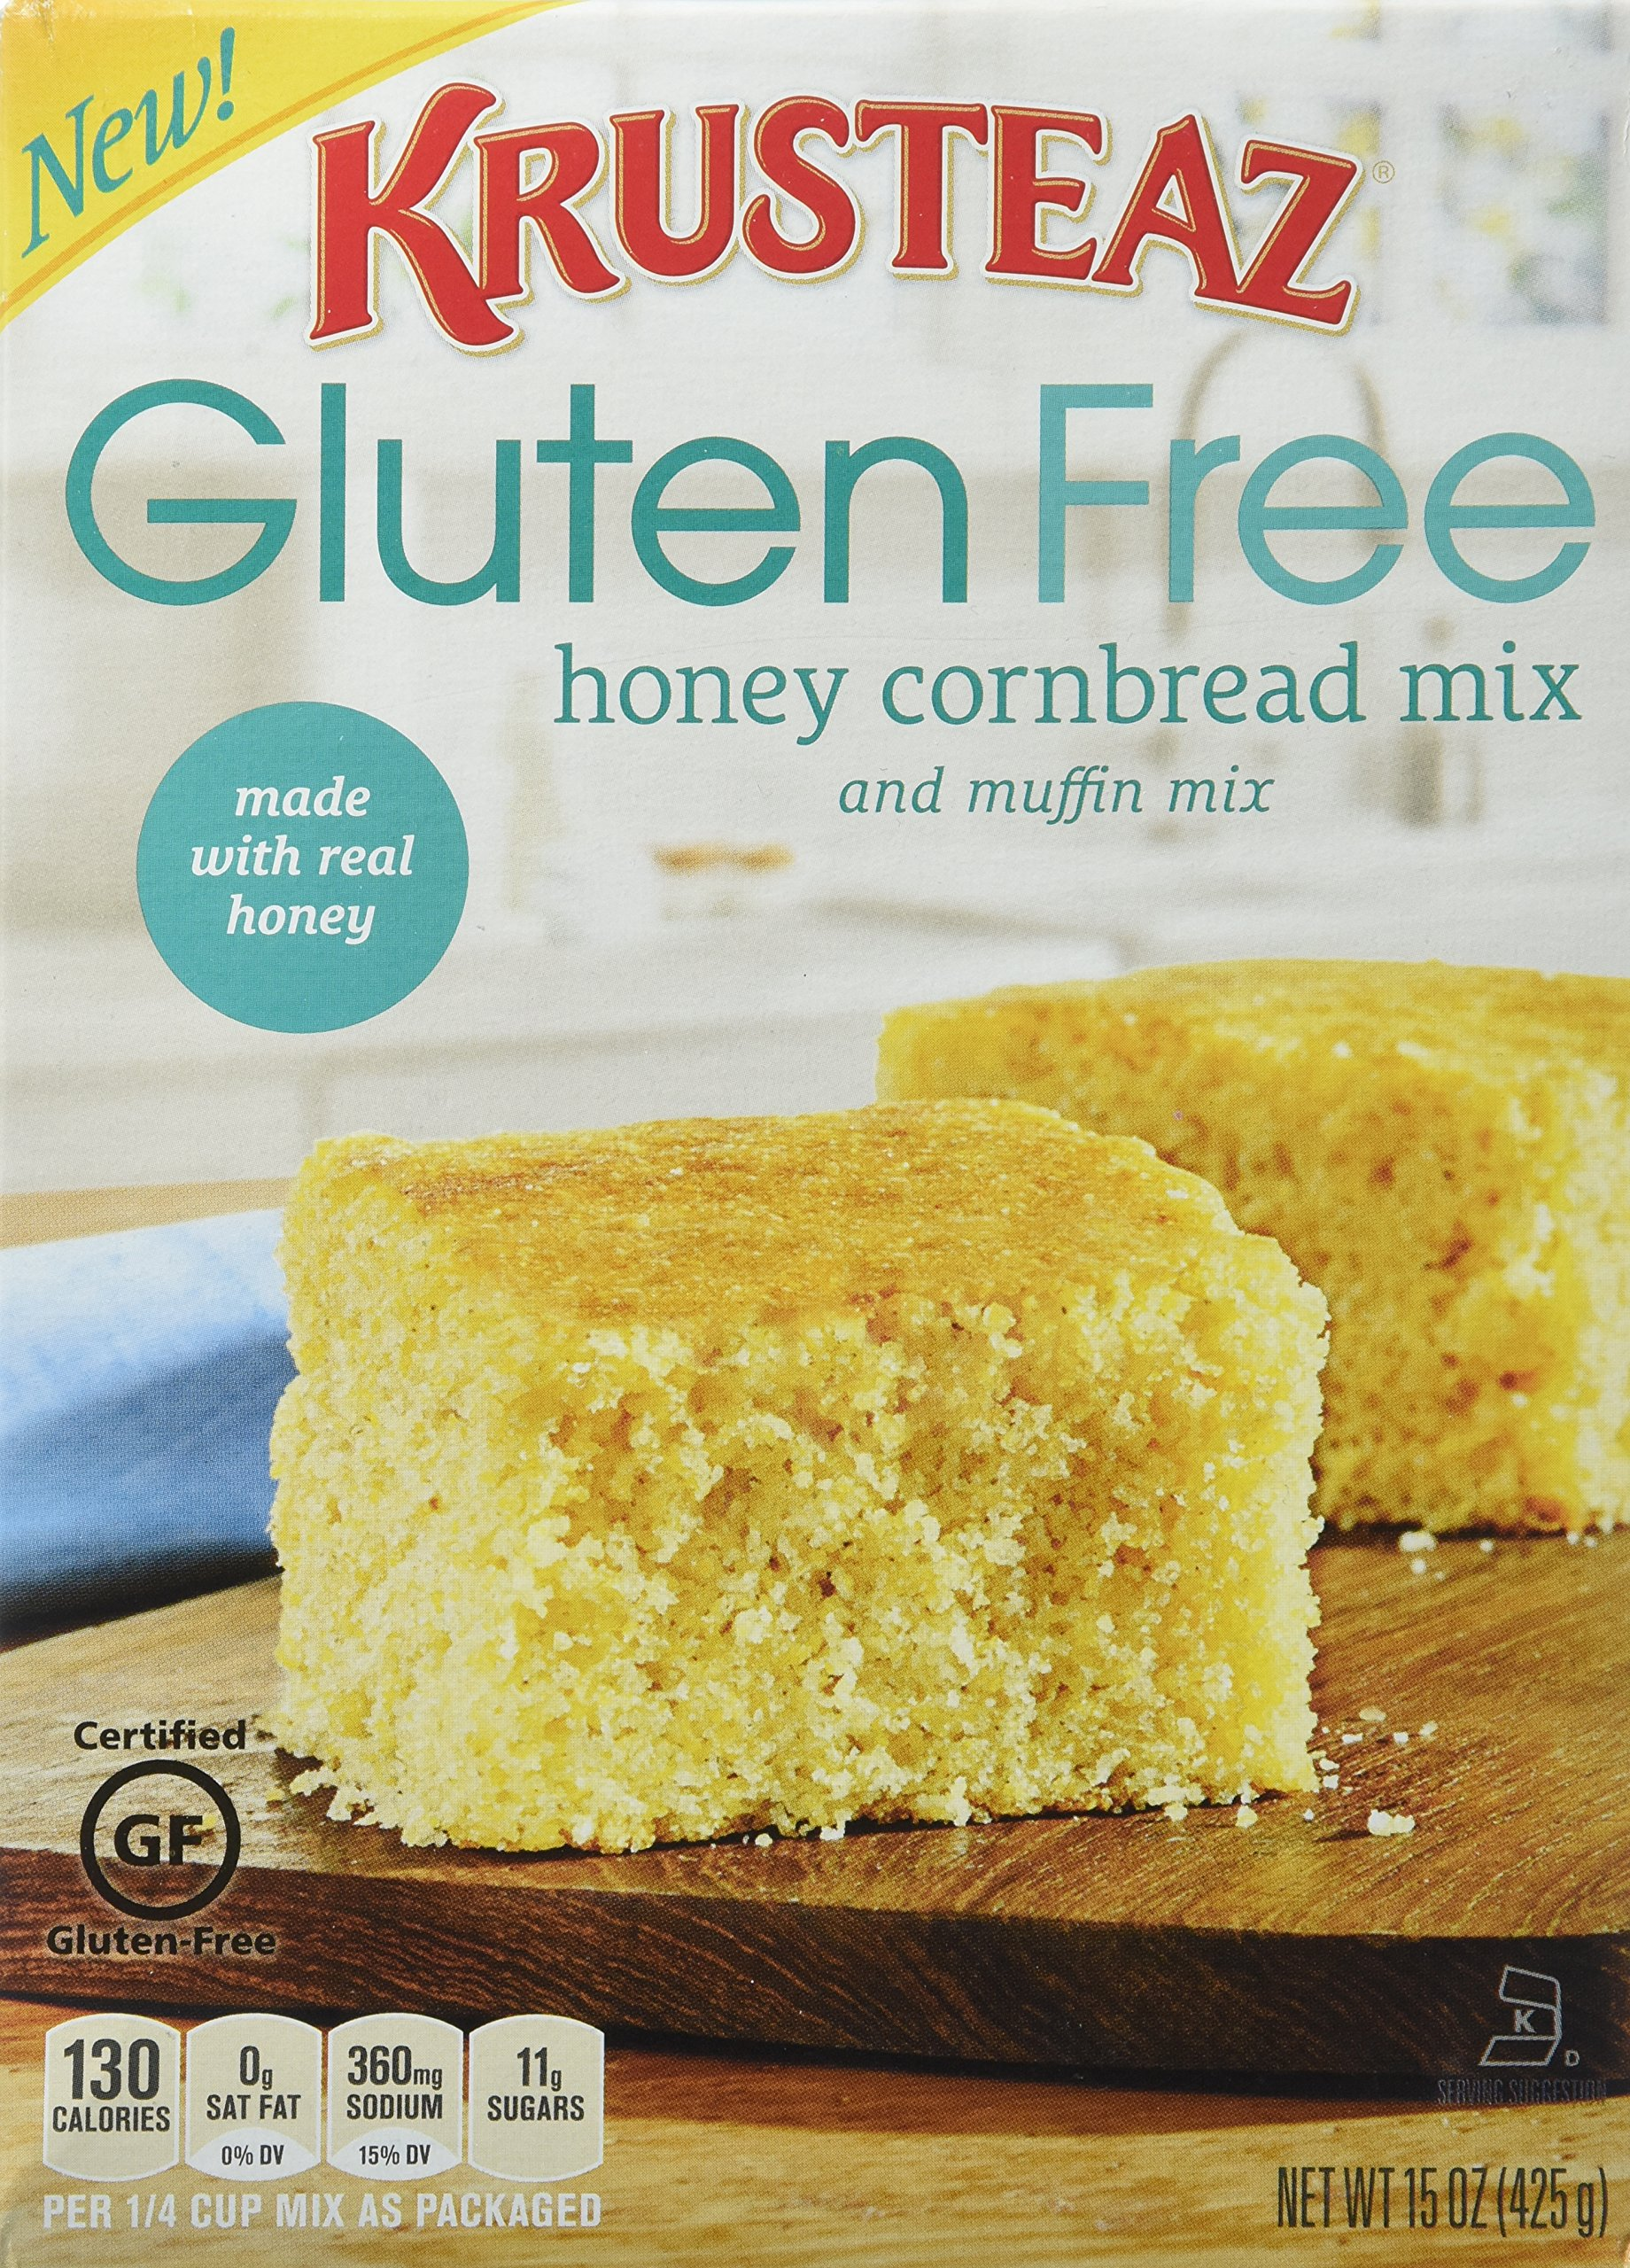 Krusteaz, Gluten Free, Honey Cornbread Mix, 15oz Box (Pack of 4) by Krusteaz